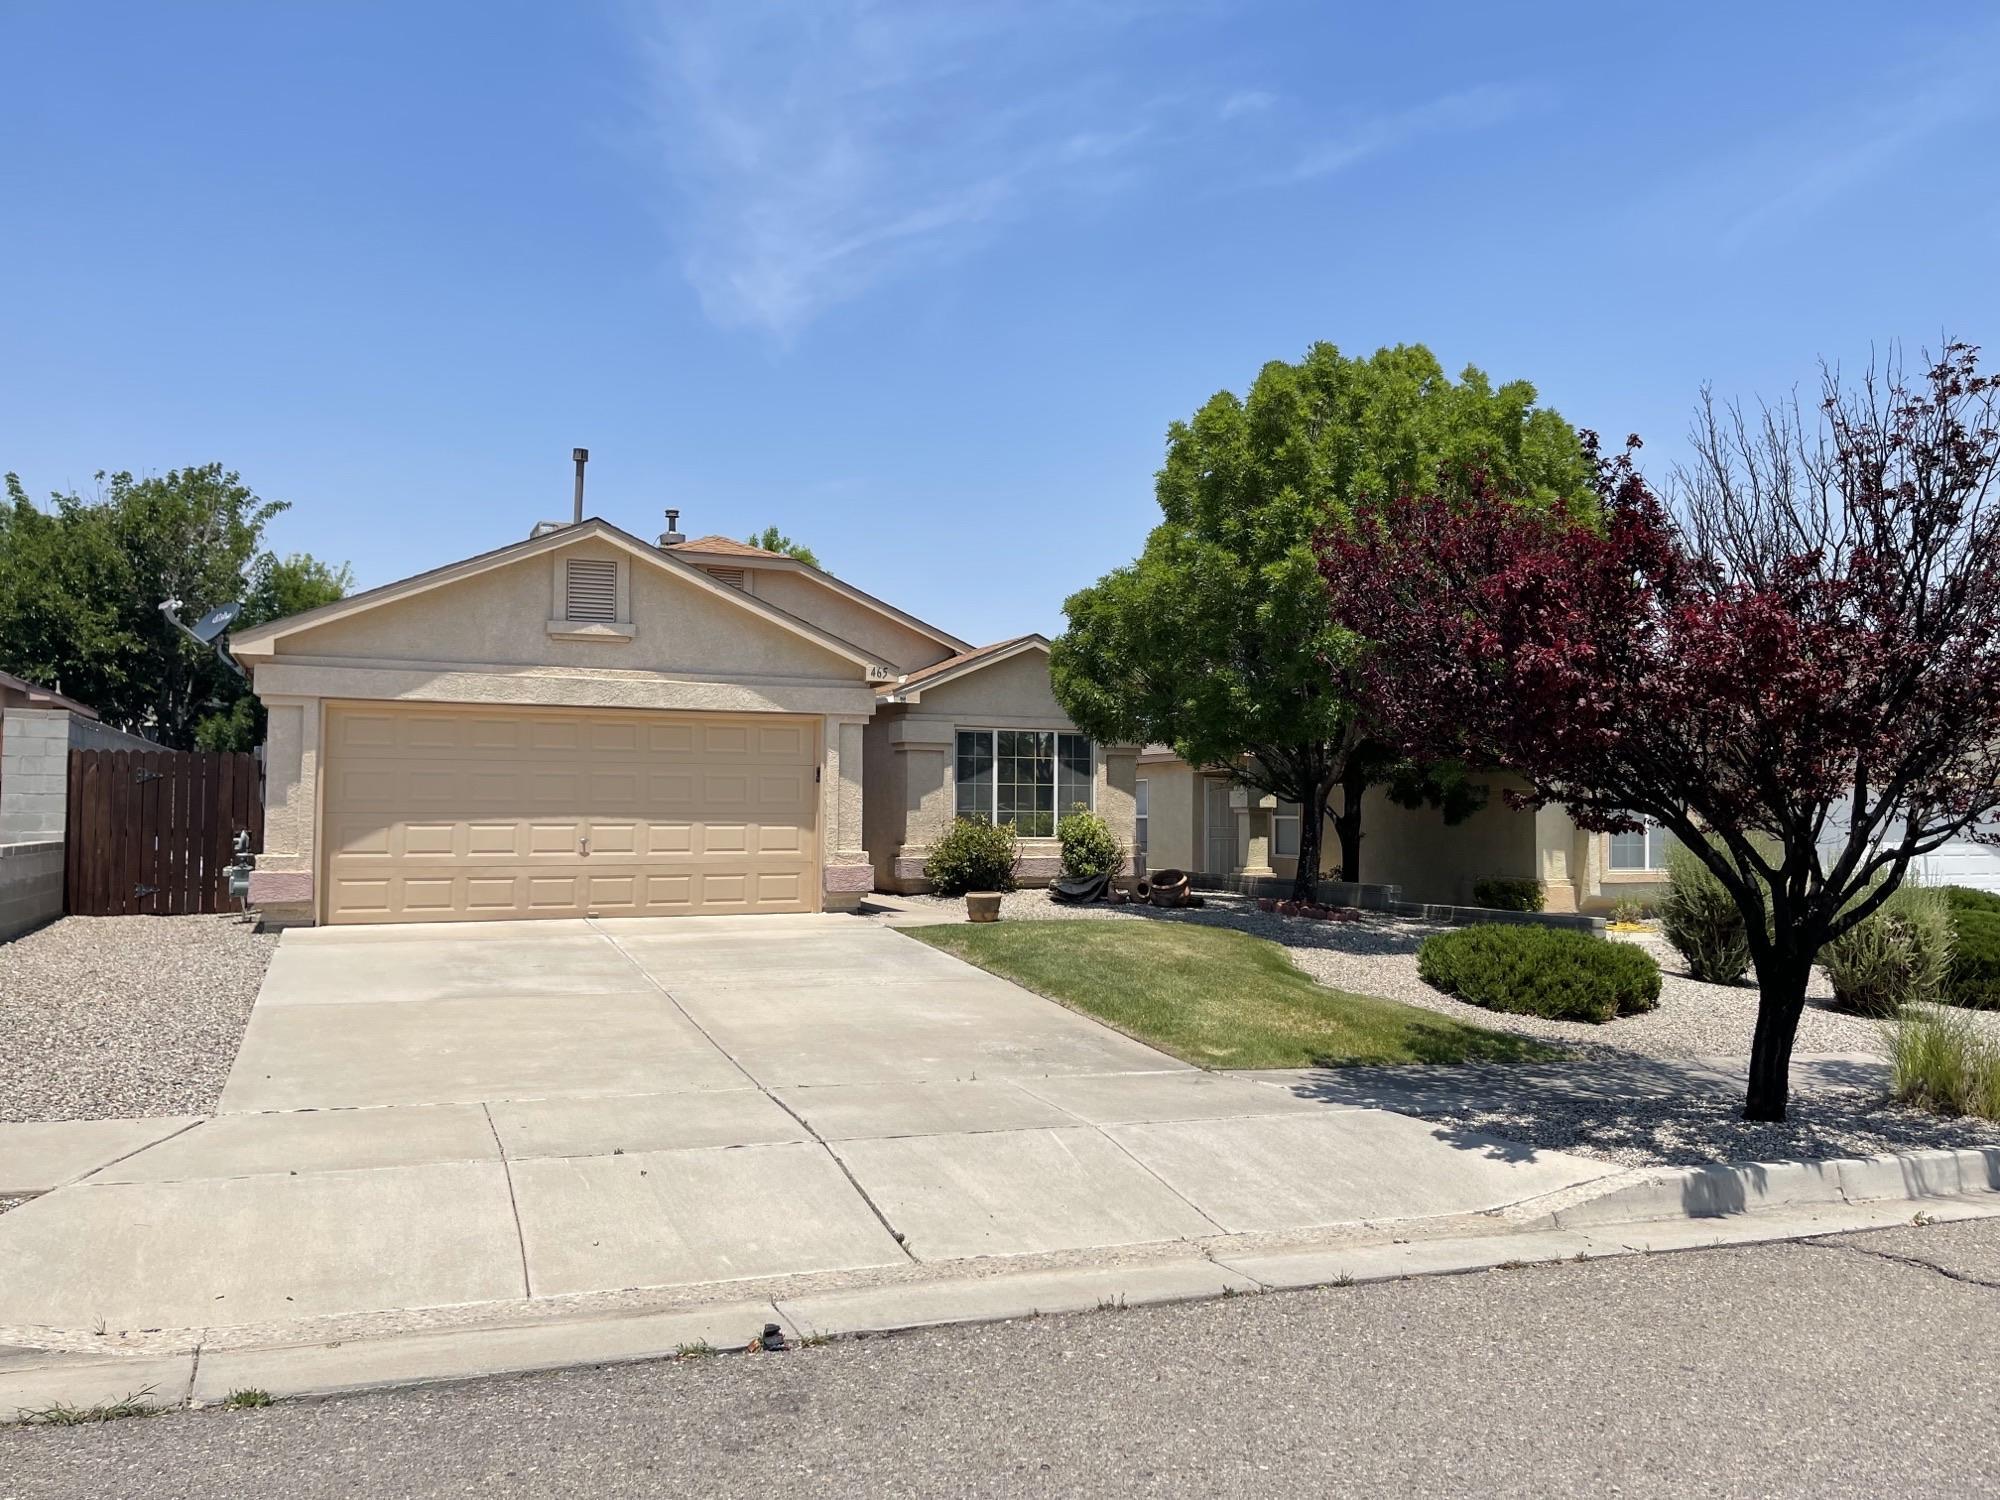 465 CHARDON MEADOWS Drive, Rio Rancho NM 87144